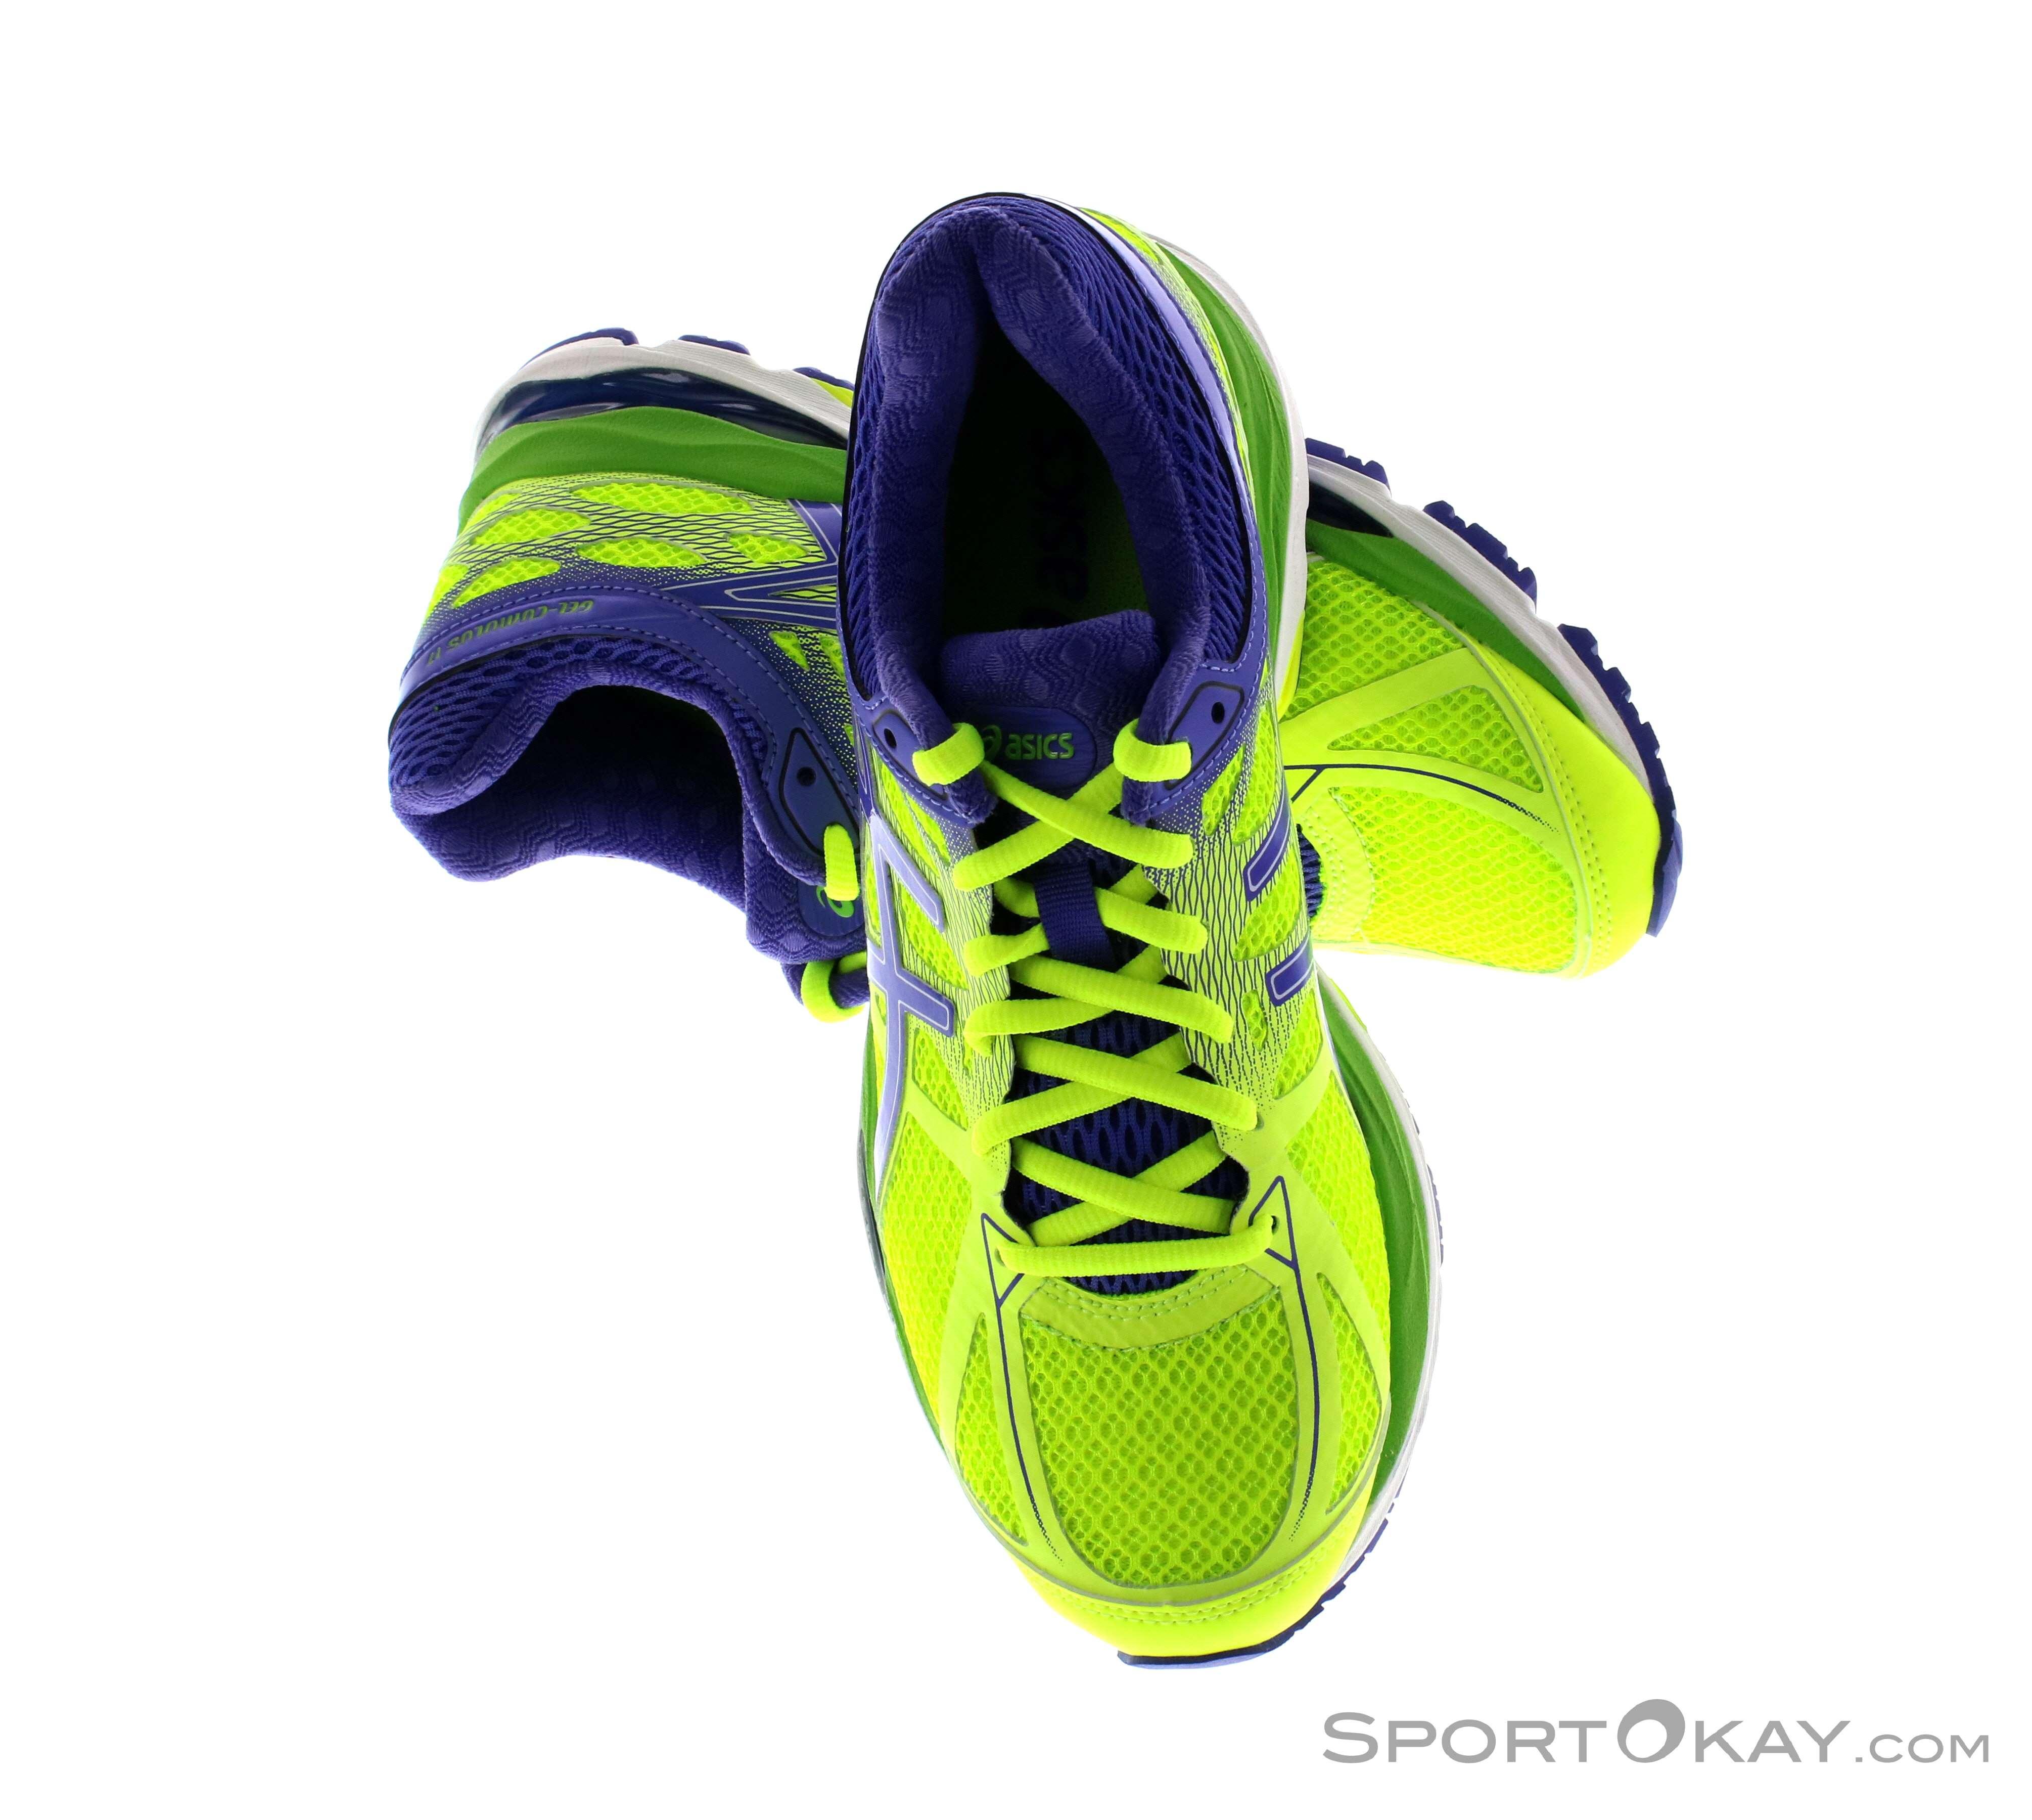 Asics Asics Gel Cumulus 17 Womens Running Shoes